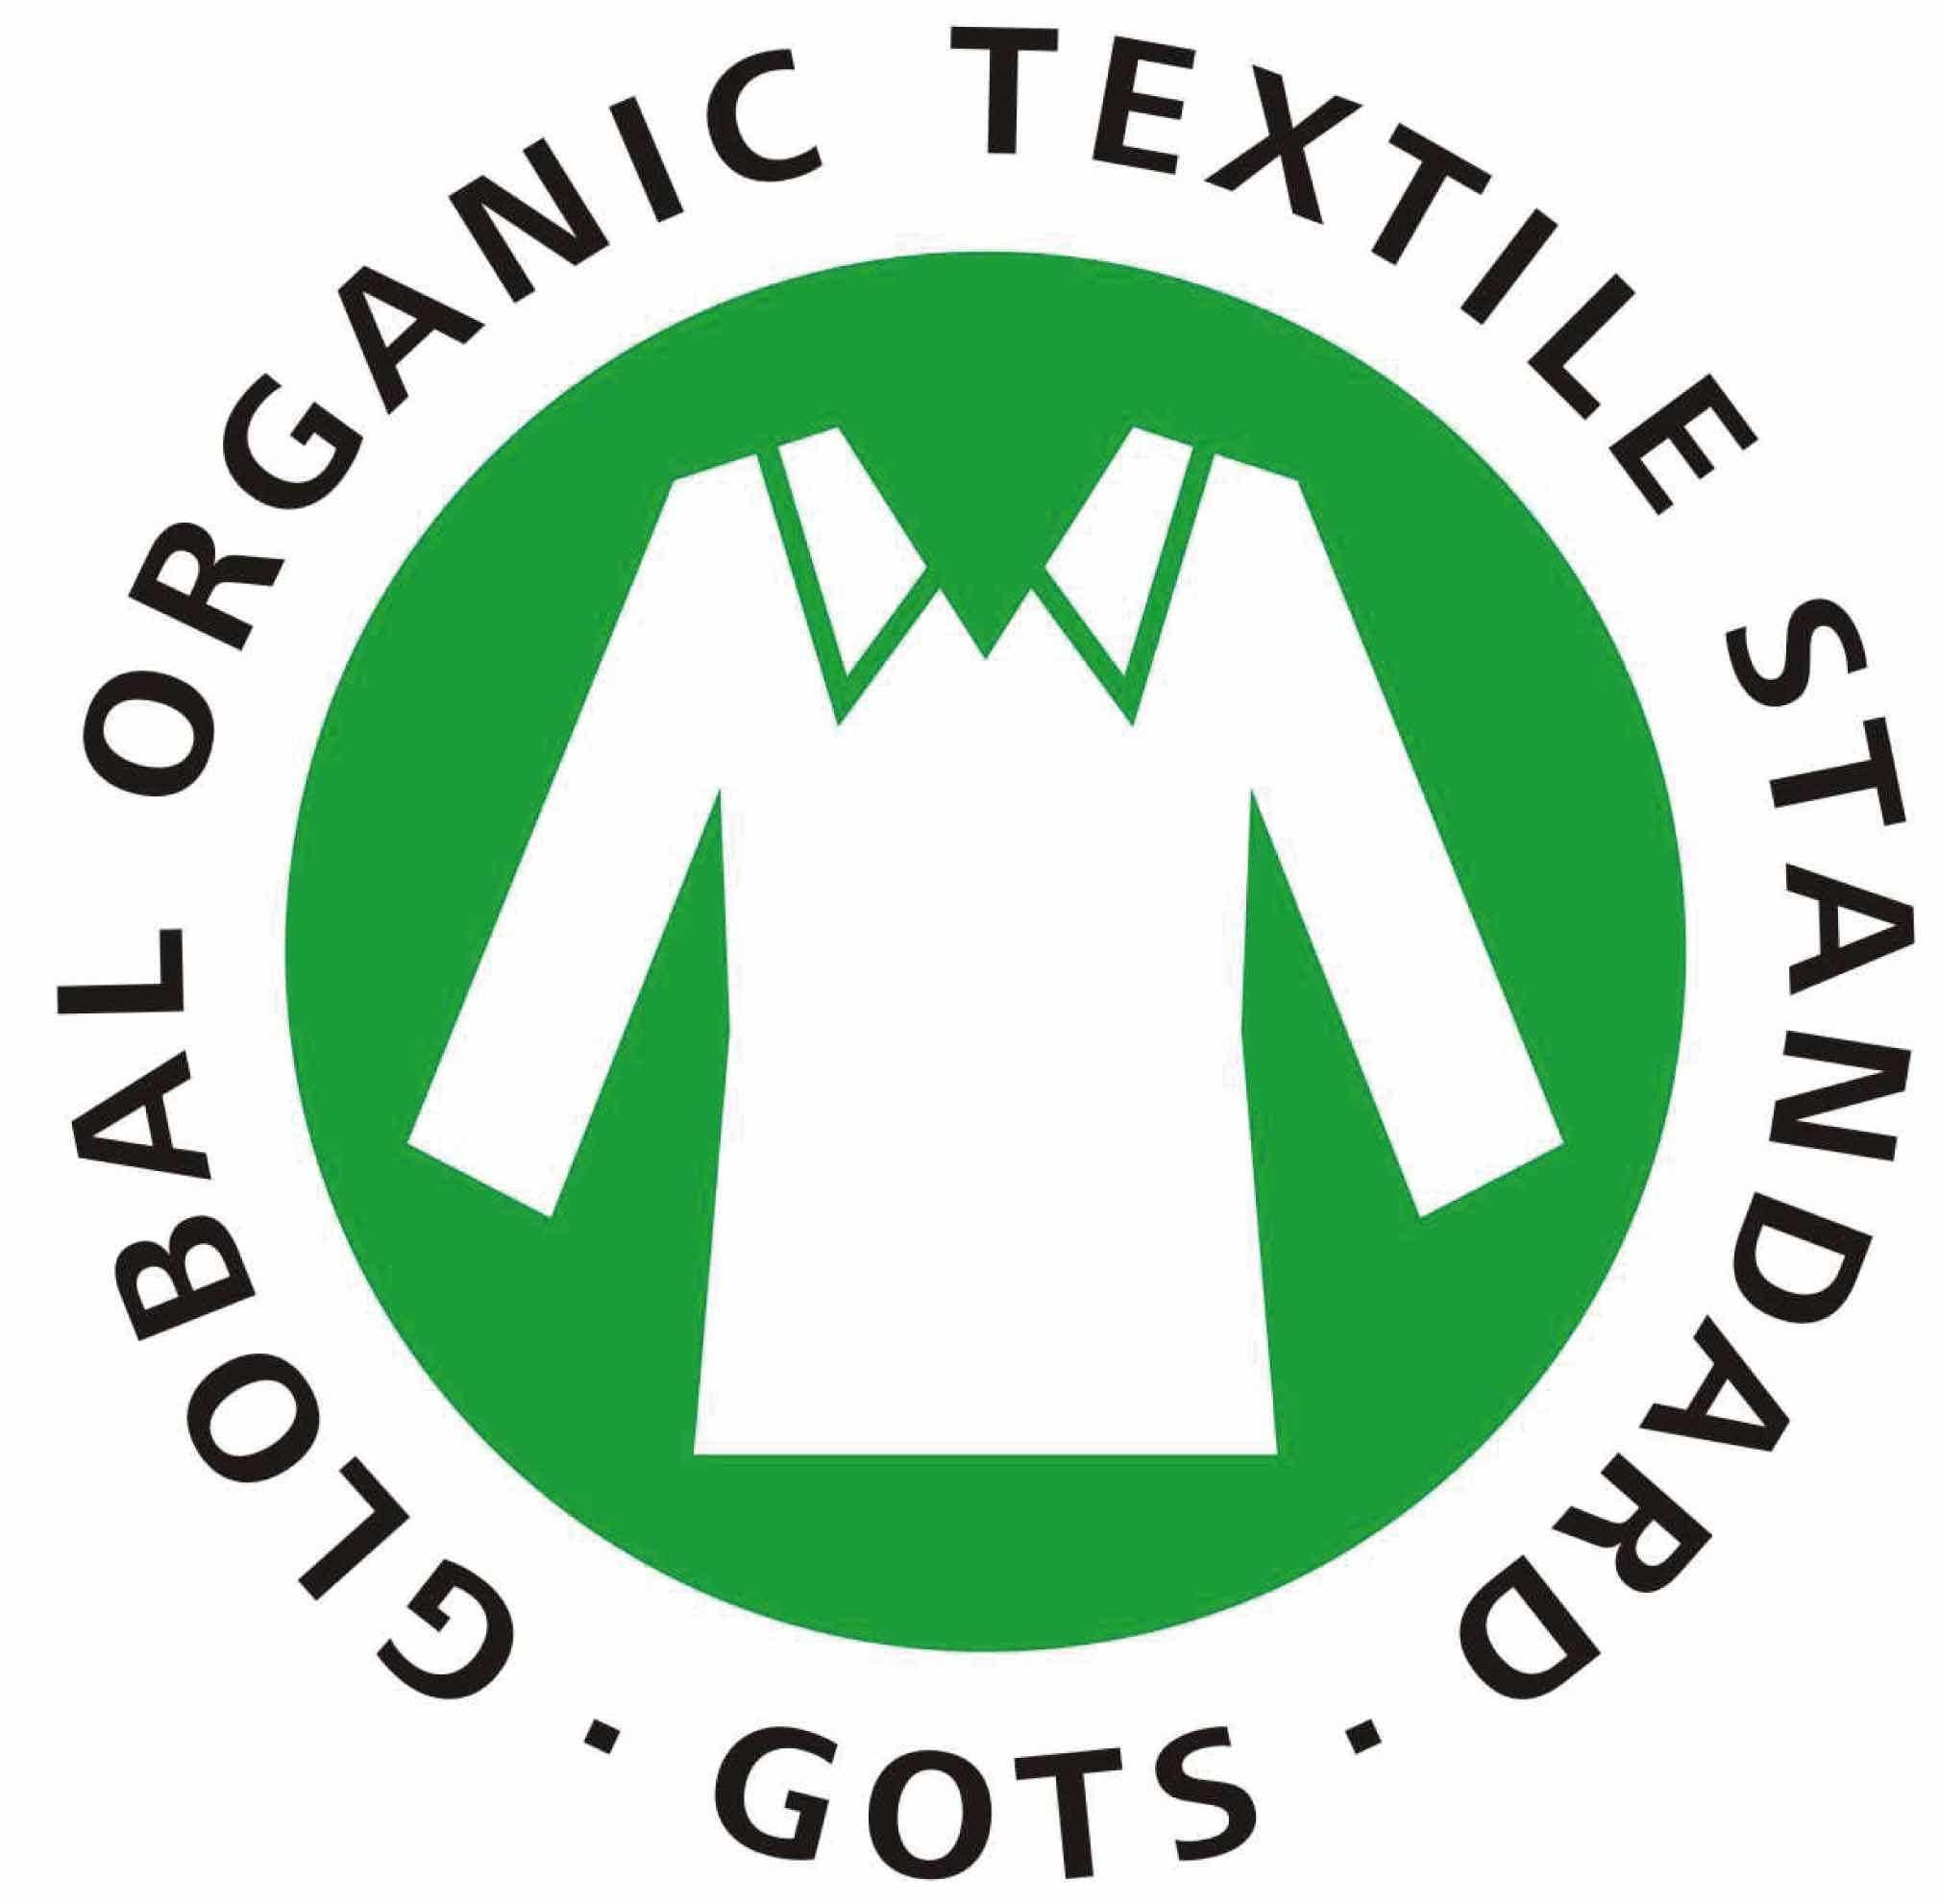 GOTS certification logo